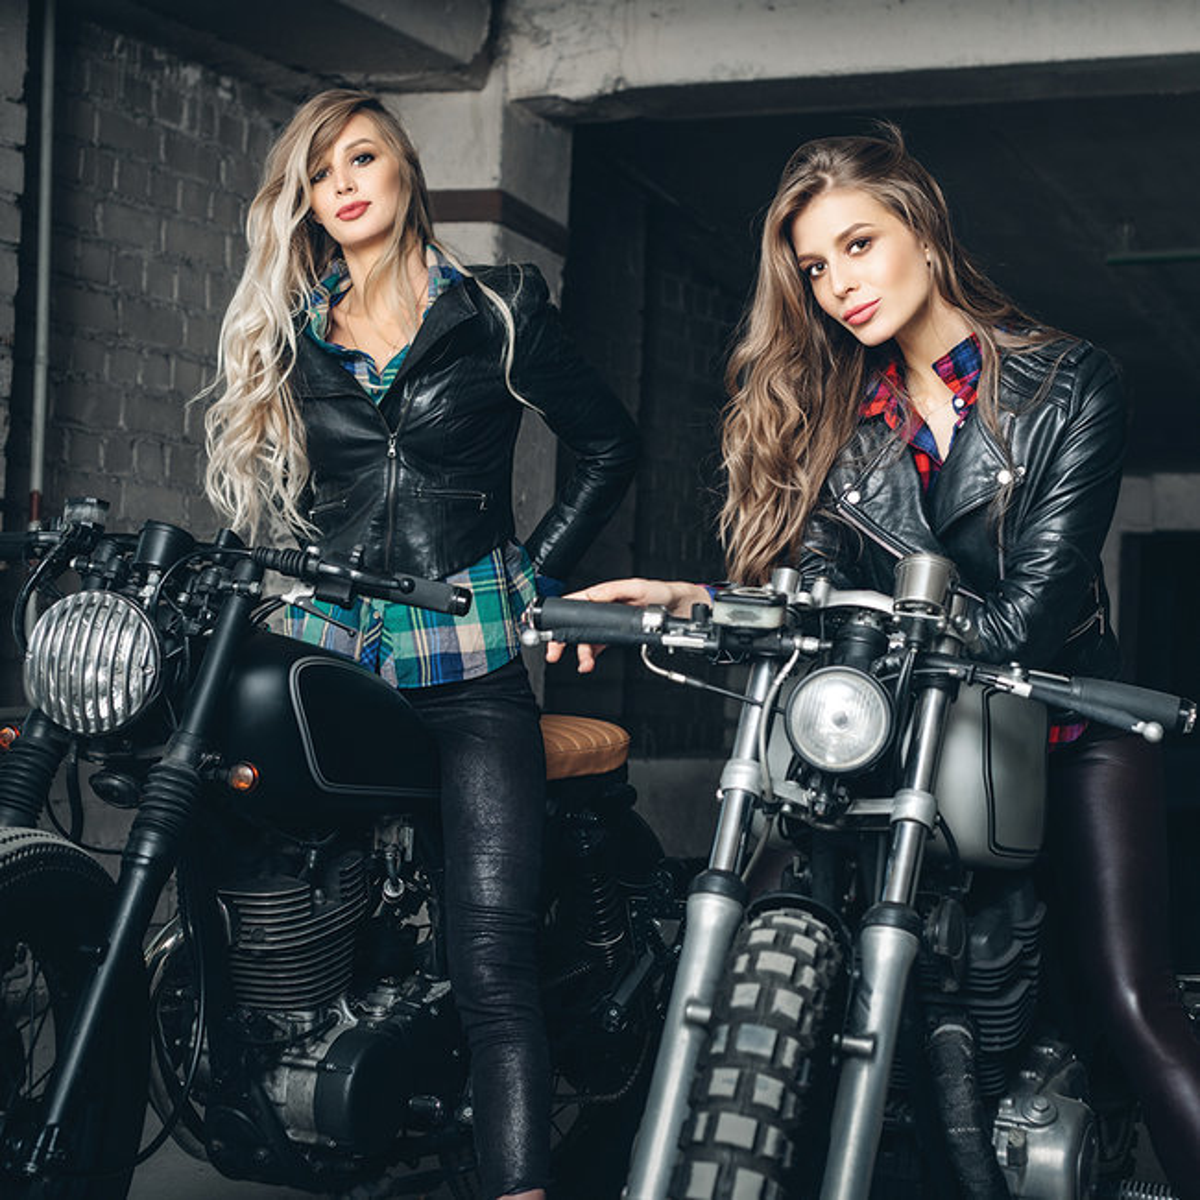 Calendrier 2021 Sexy femme et moto